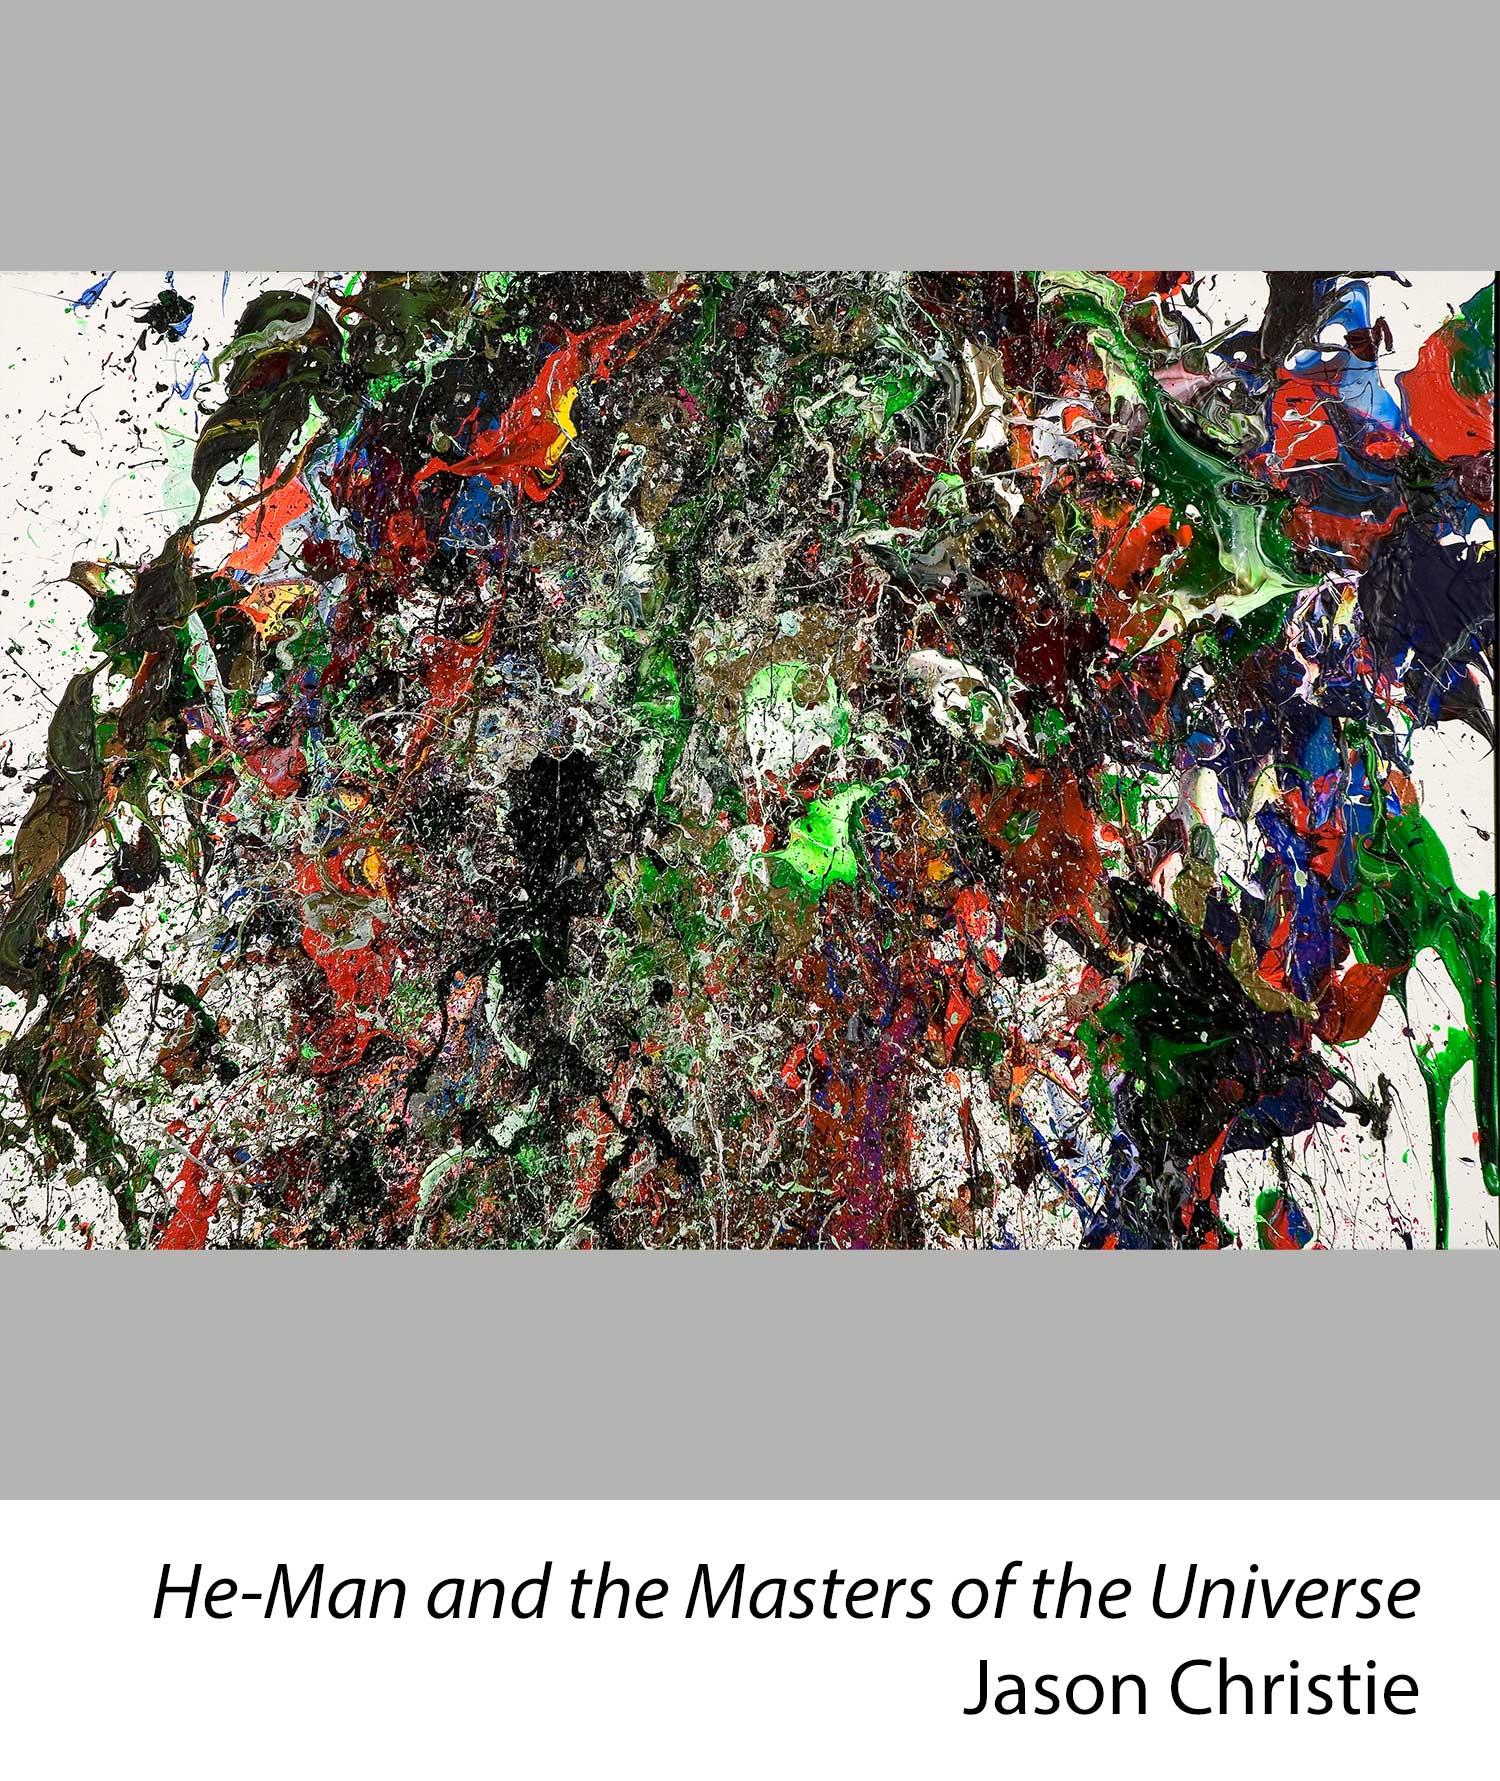 He-Man by Jason Christie